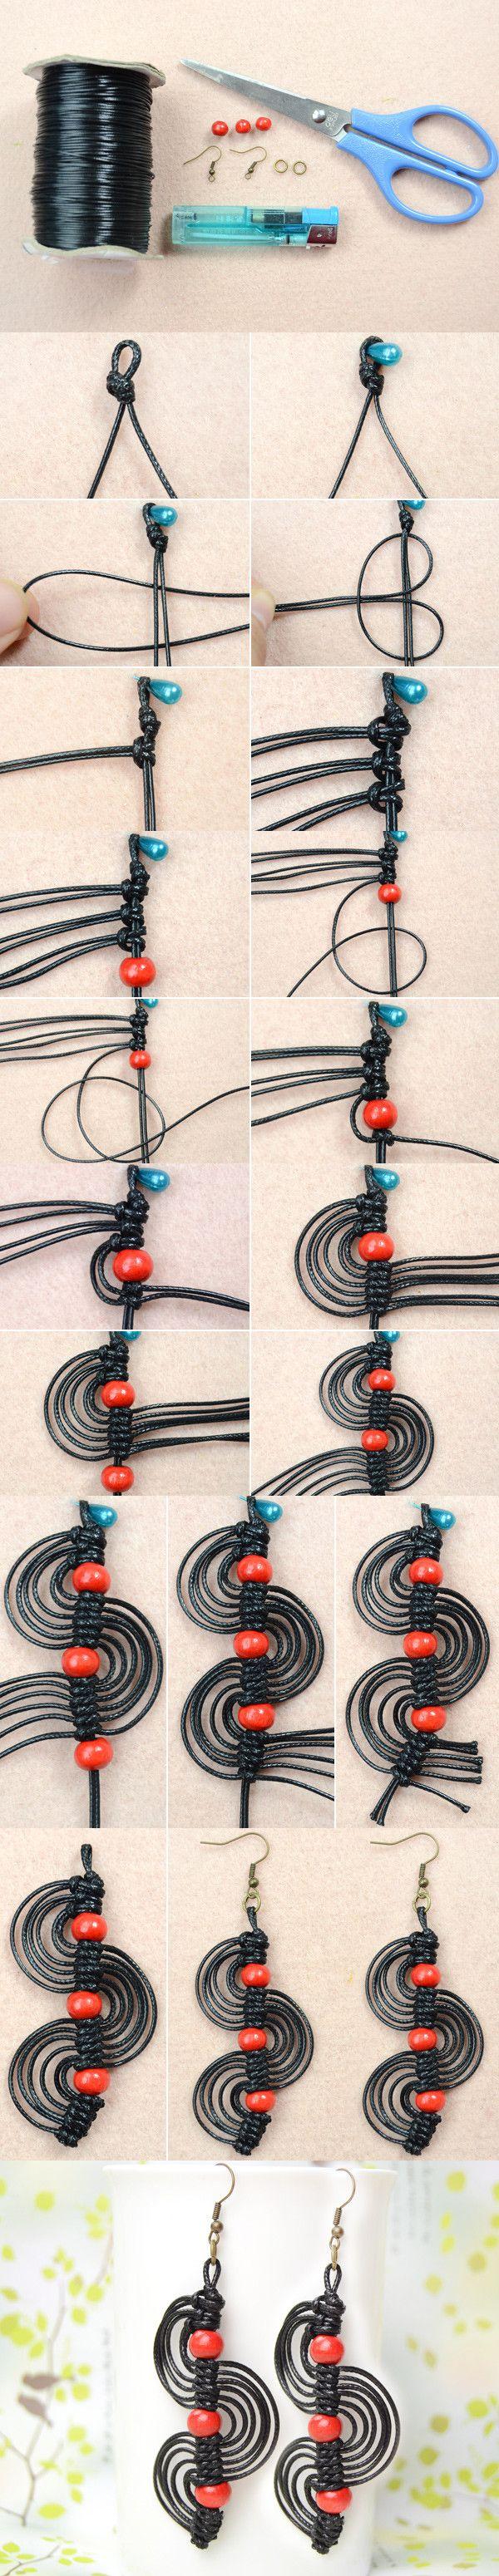 Micro Macrame Earrings Tutorial-DIY Black Macrame Spiral Earrings with Red Wood Beads from LC.Pandahall.com    #pandahall